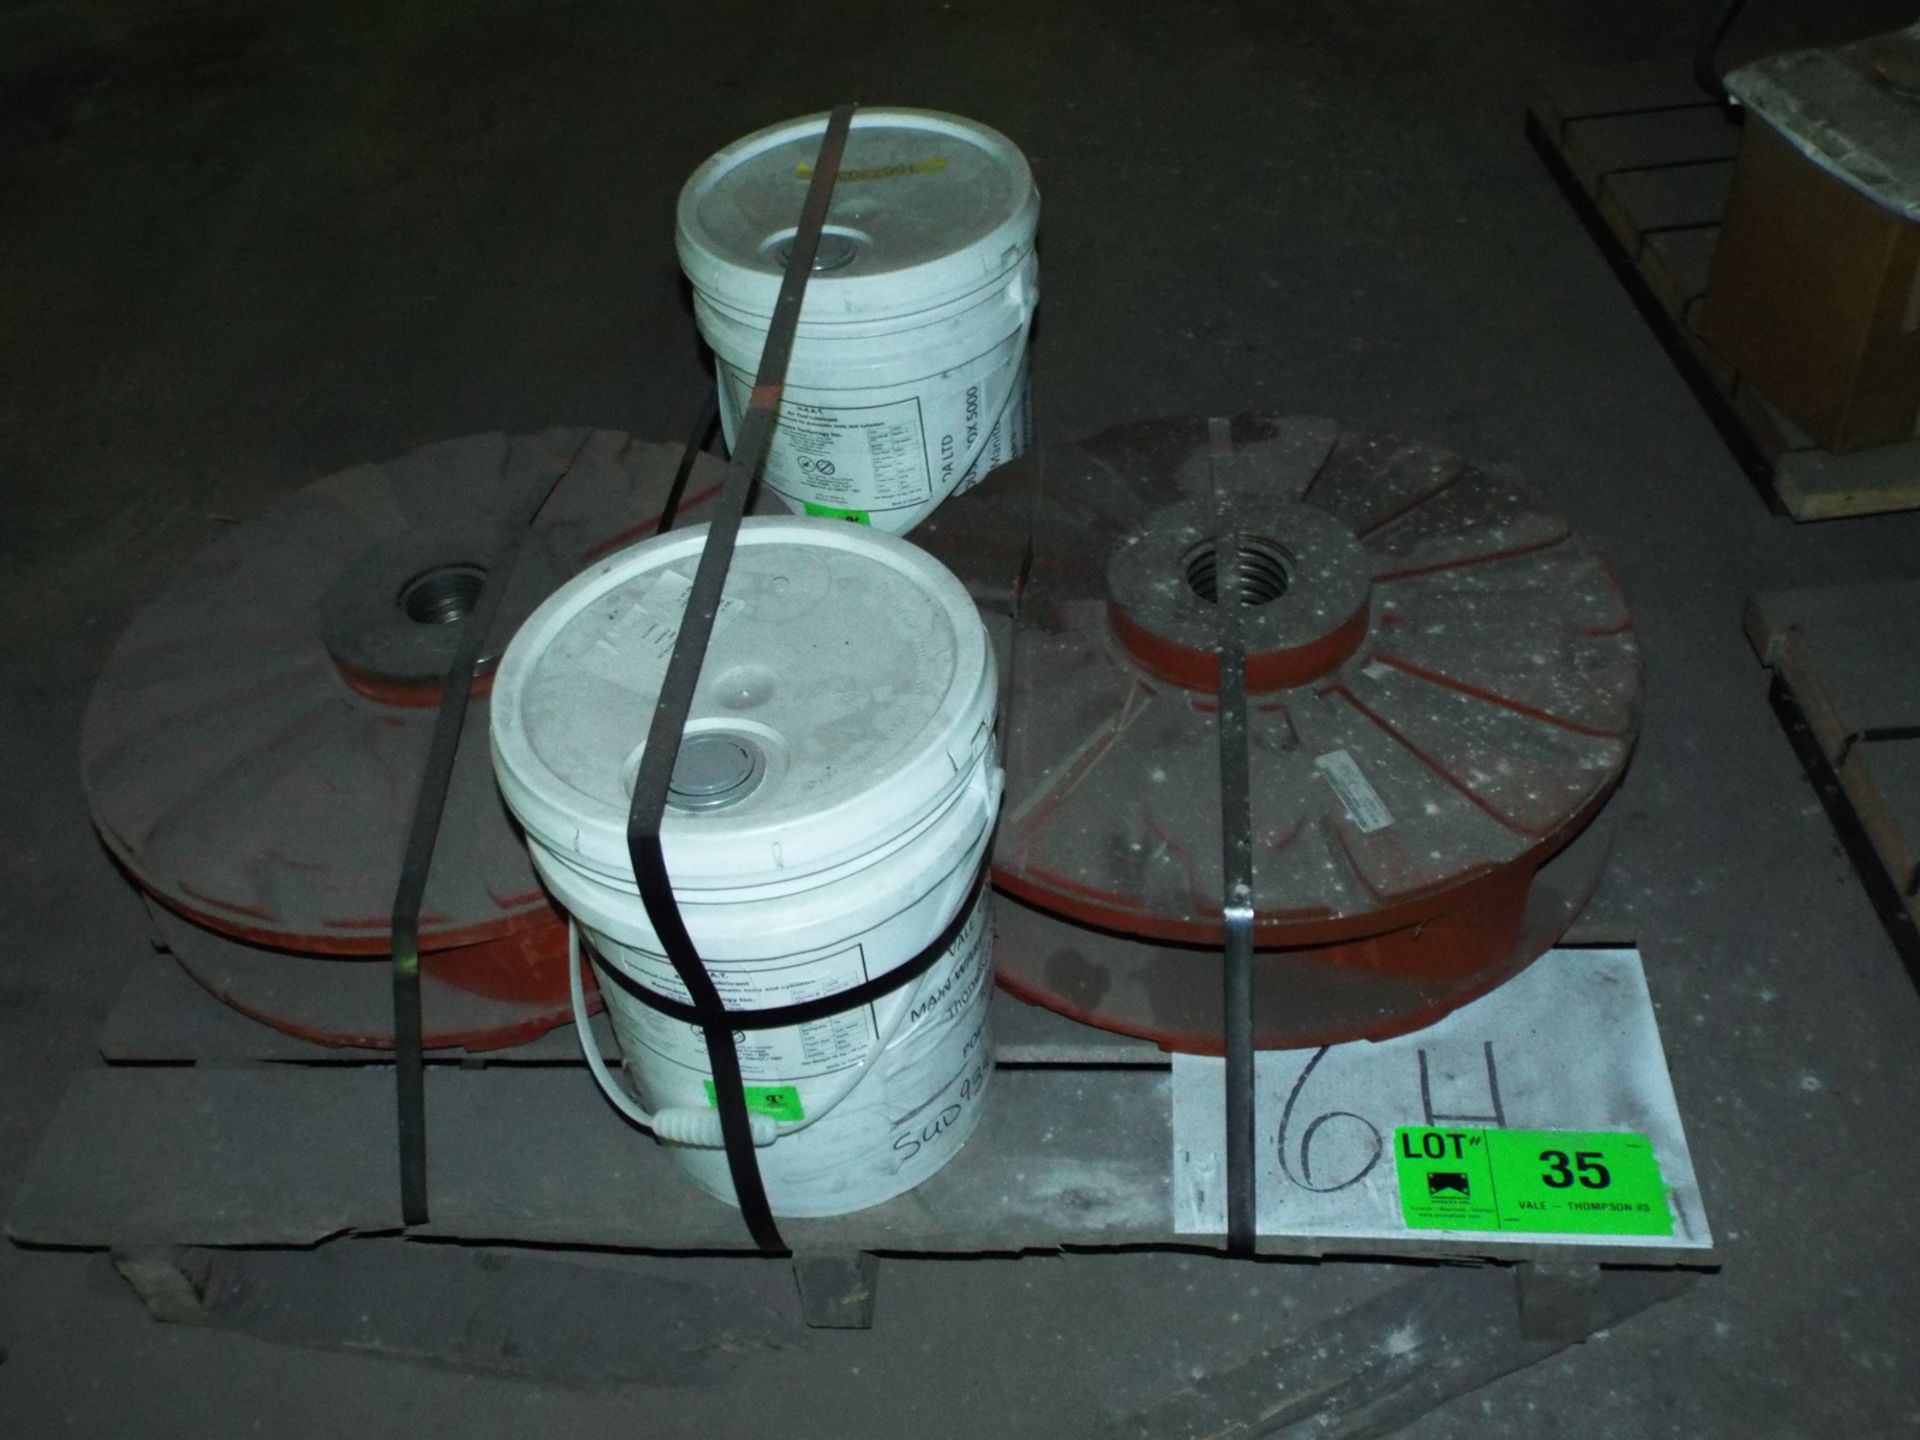 LOT/ CONTENTS OF SKID - (2) 4 VANE IMPELLER PUMPS, (2) 20L PAILS HHAT AIR TOOL LUBRICANT (PLT 6H)